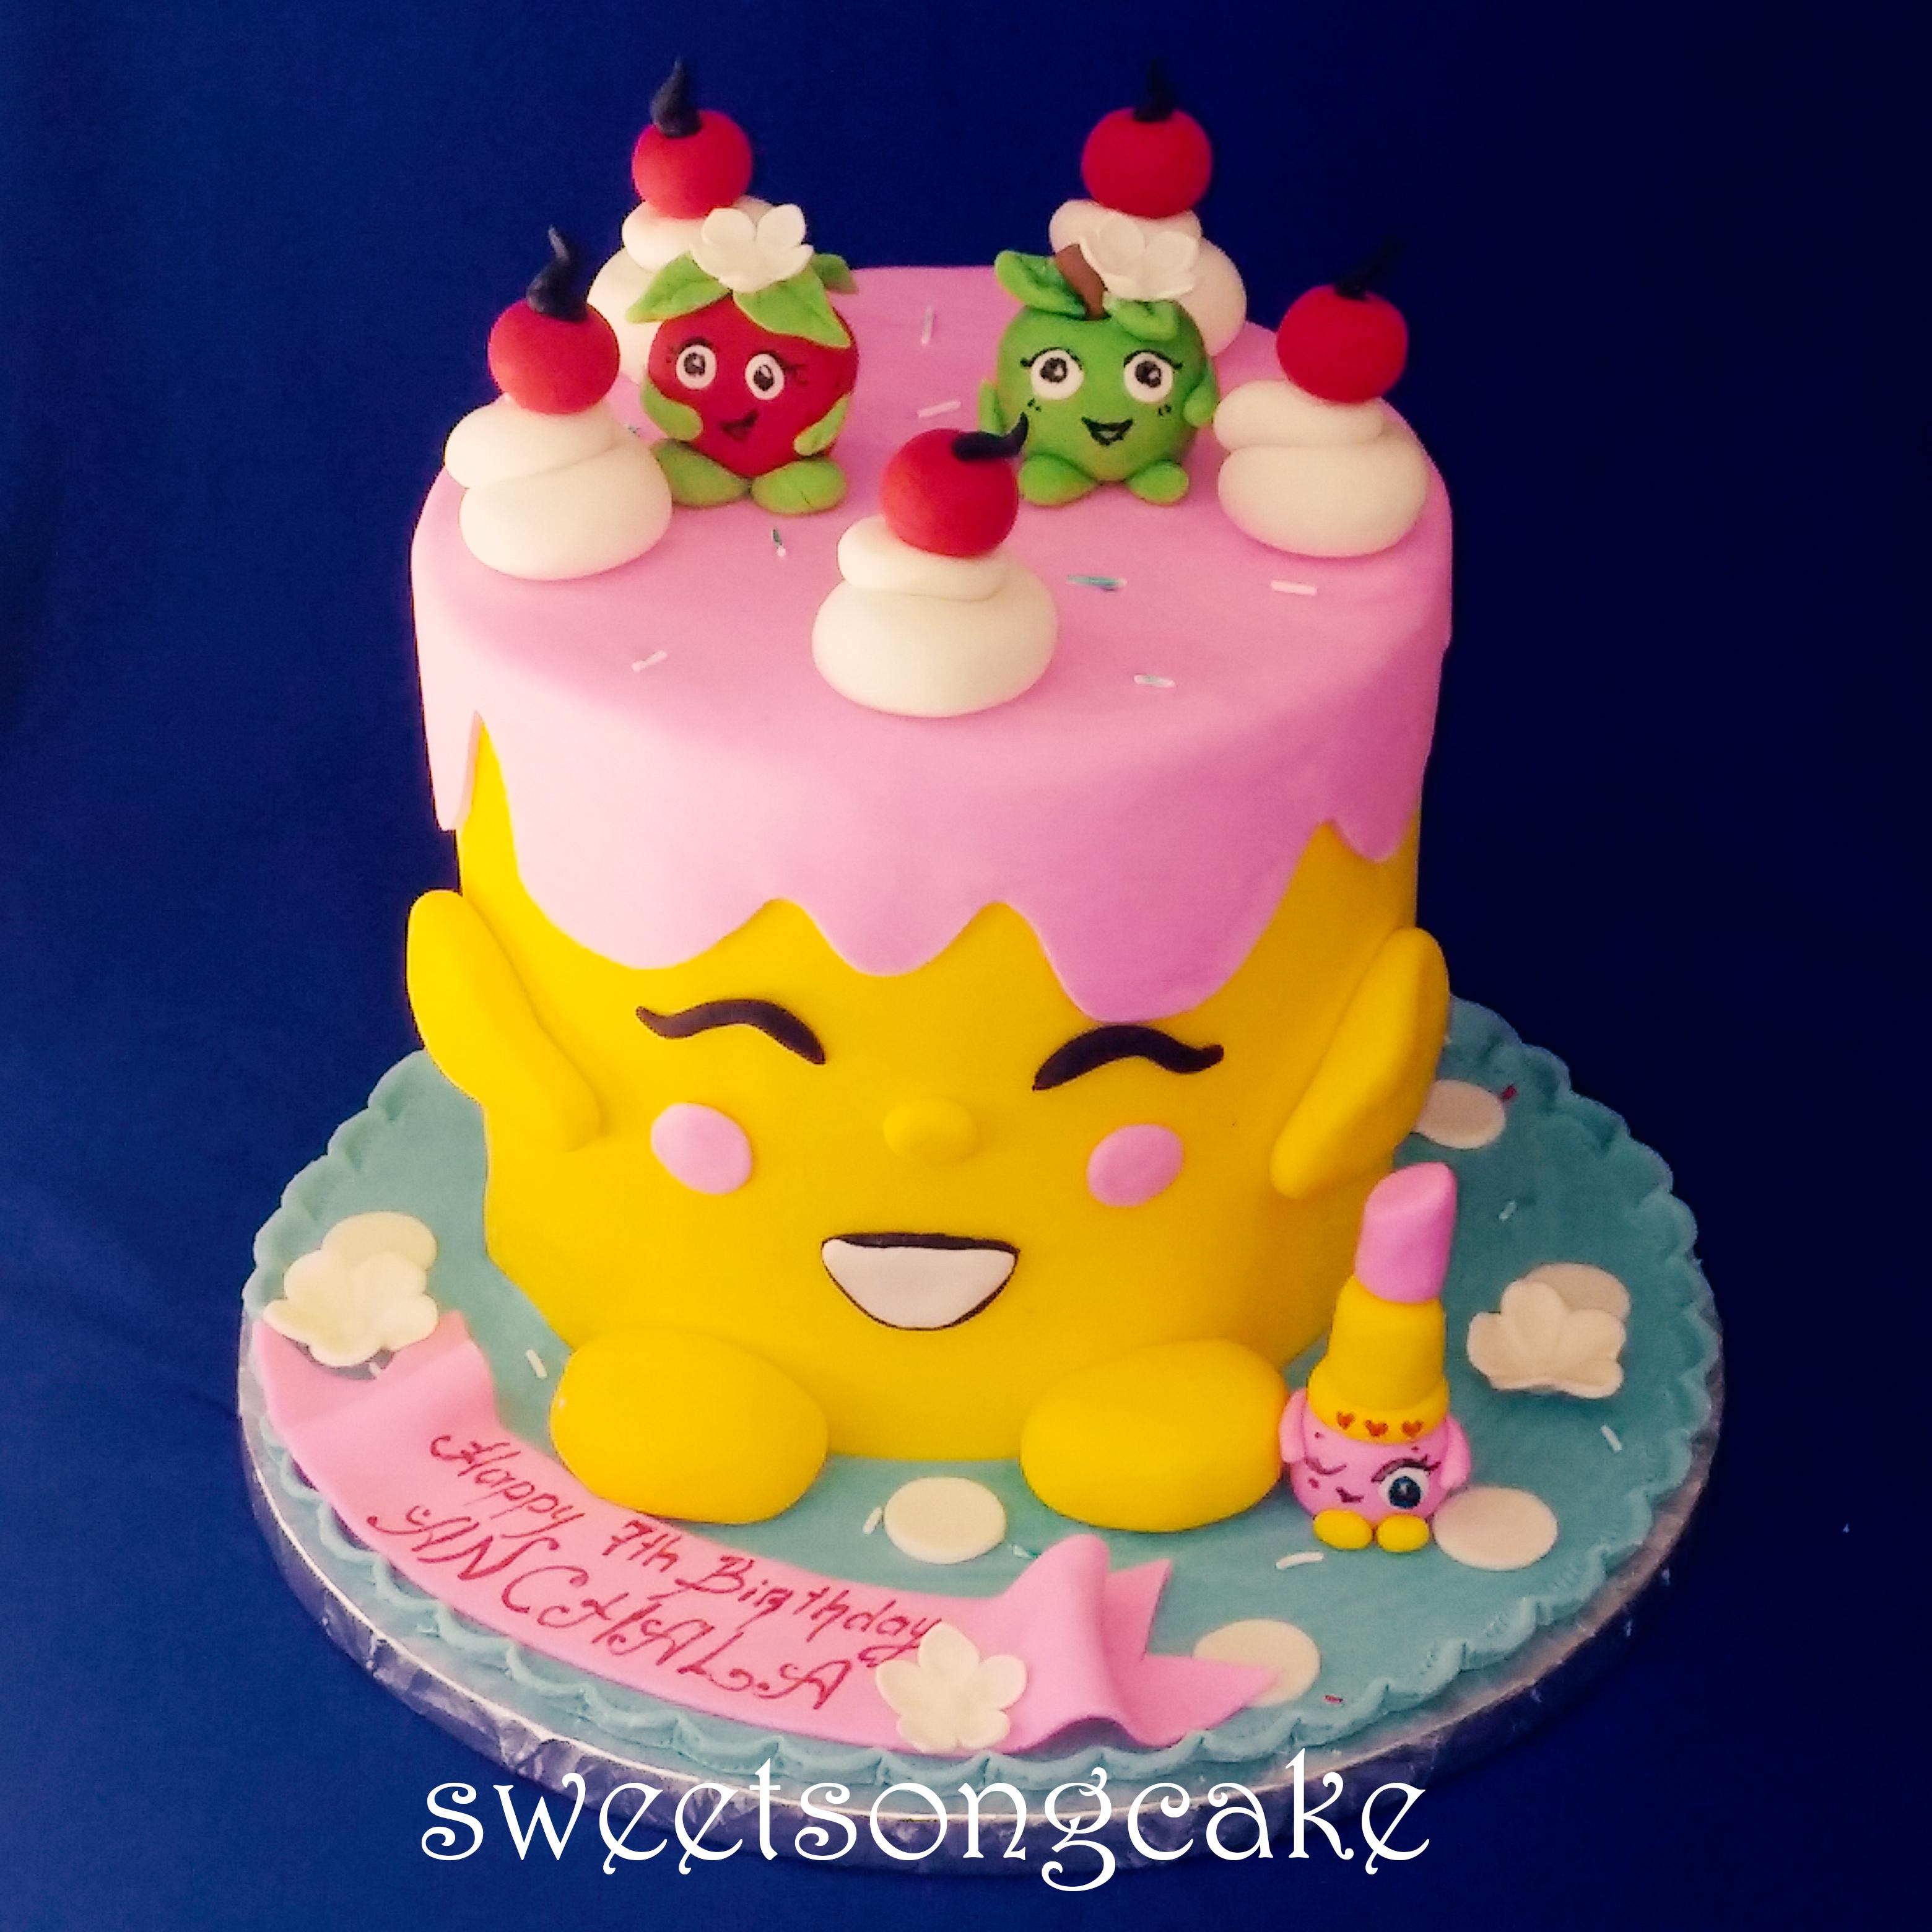 Children cakes | Ottawa wedding and other celebration cakes